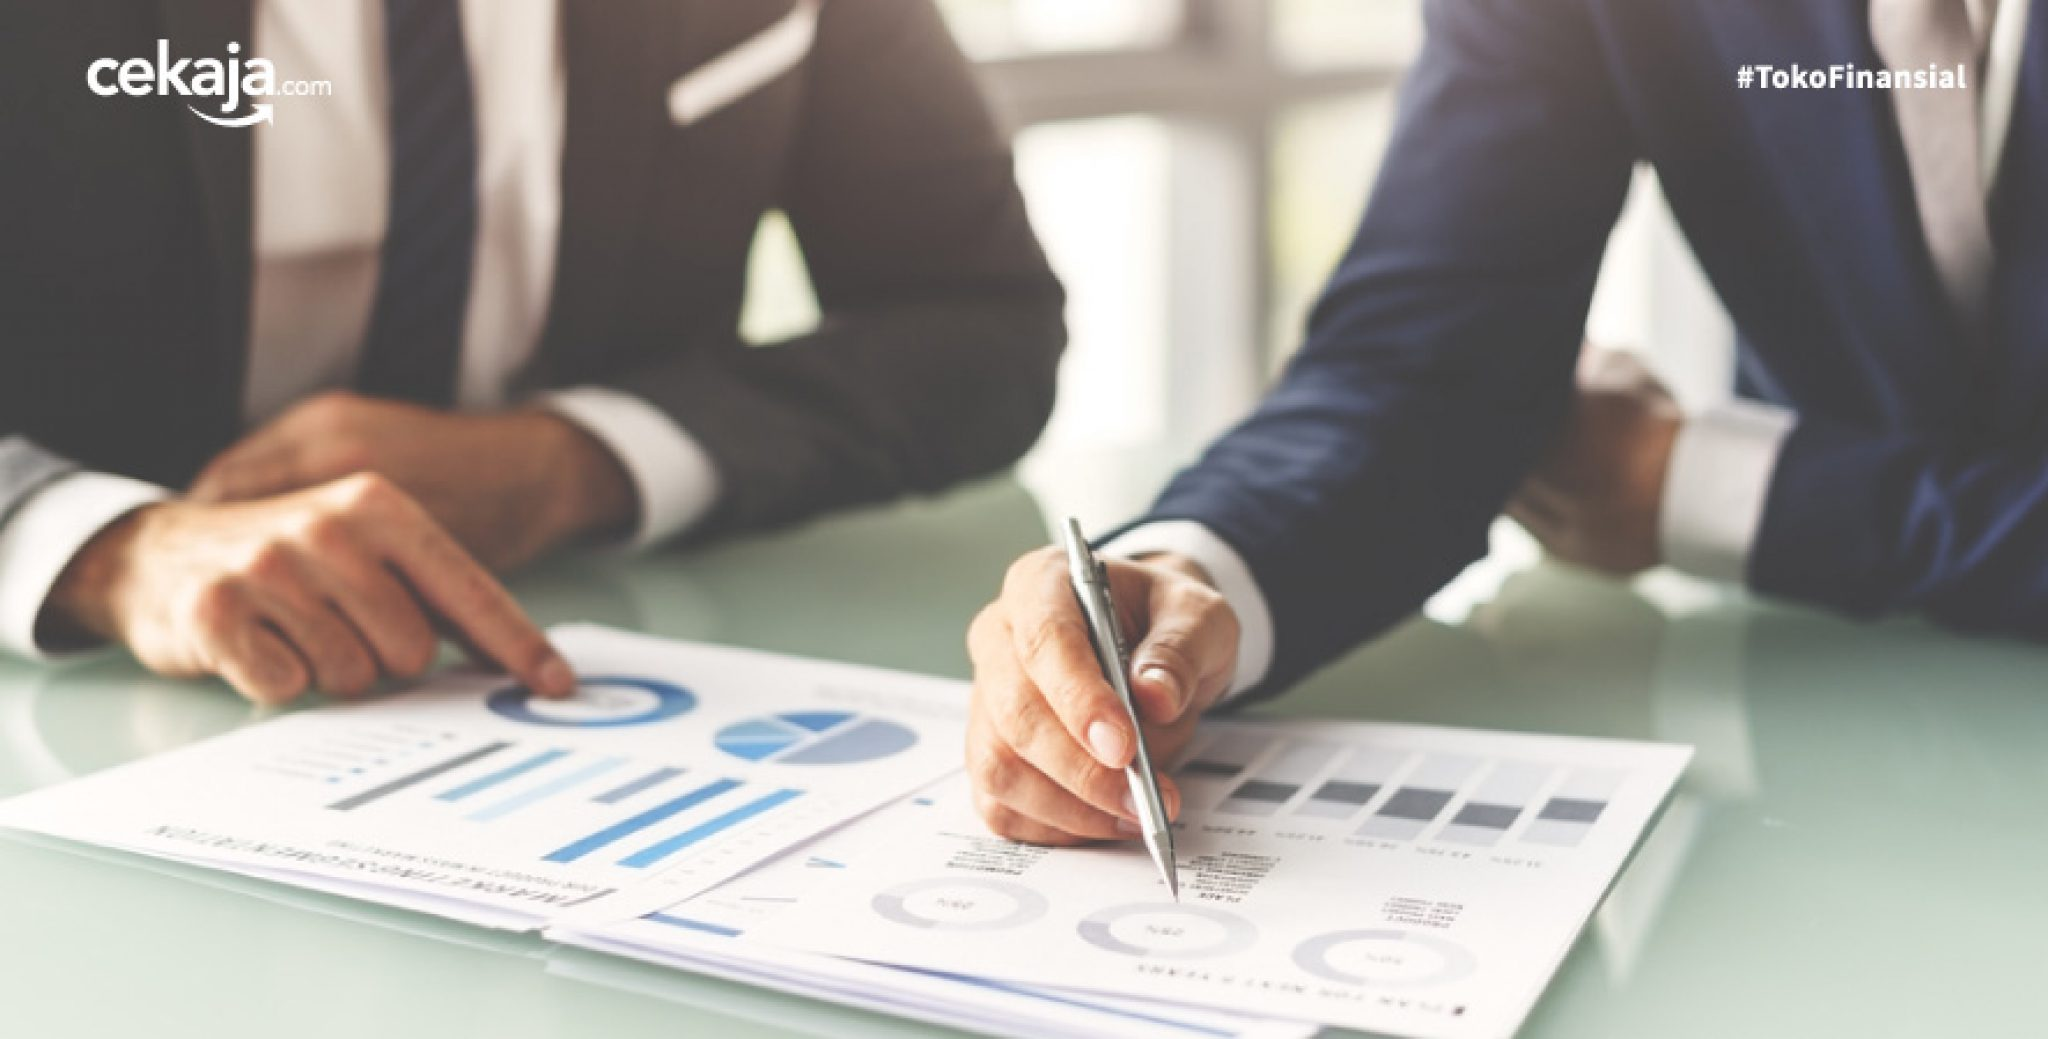 Surat Keterangan Usaha Untuk Pelaku Bisnis